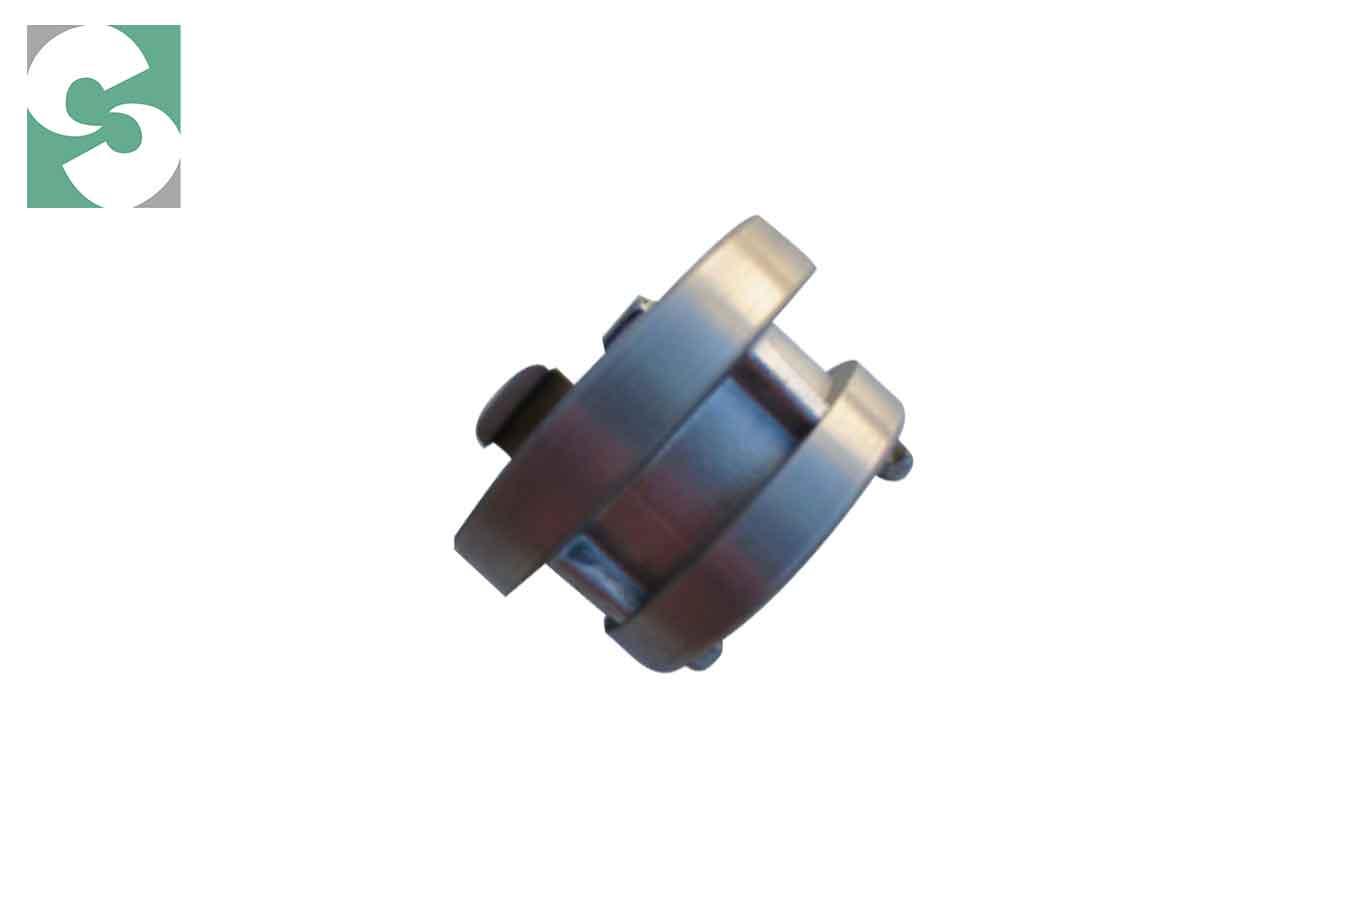 Acople Storz Aluminio Traspaso